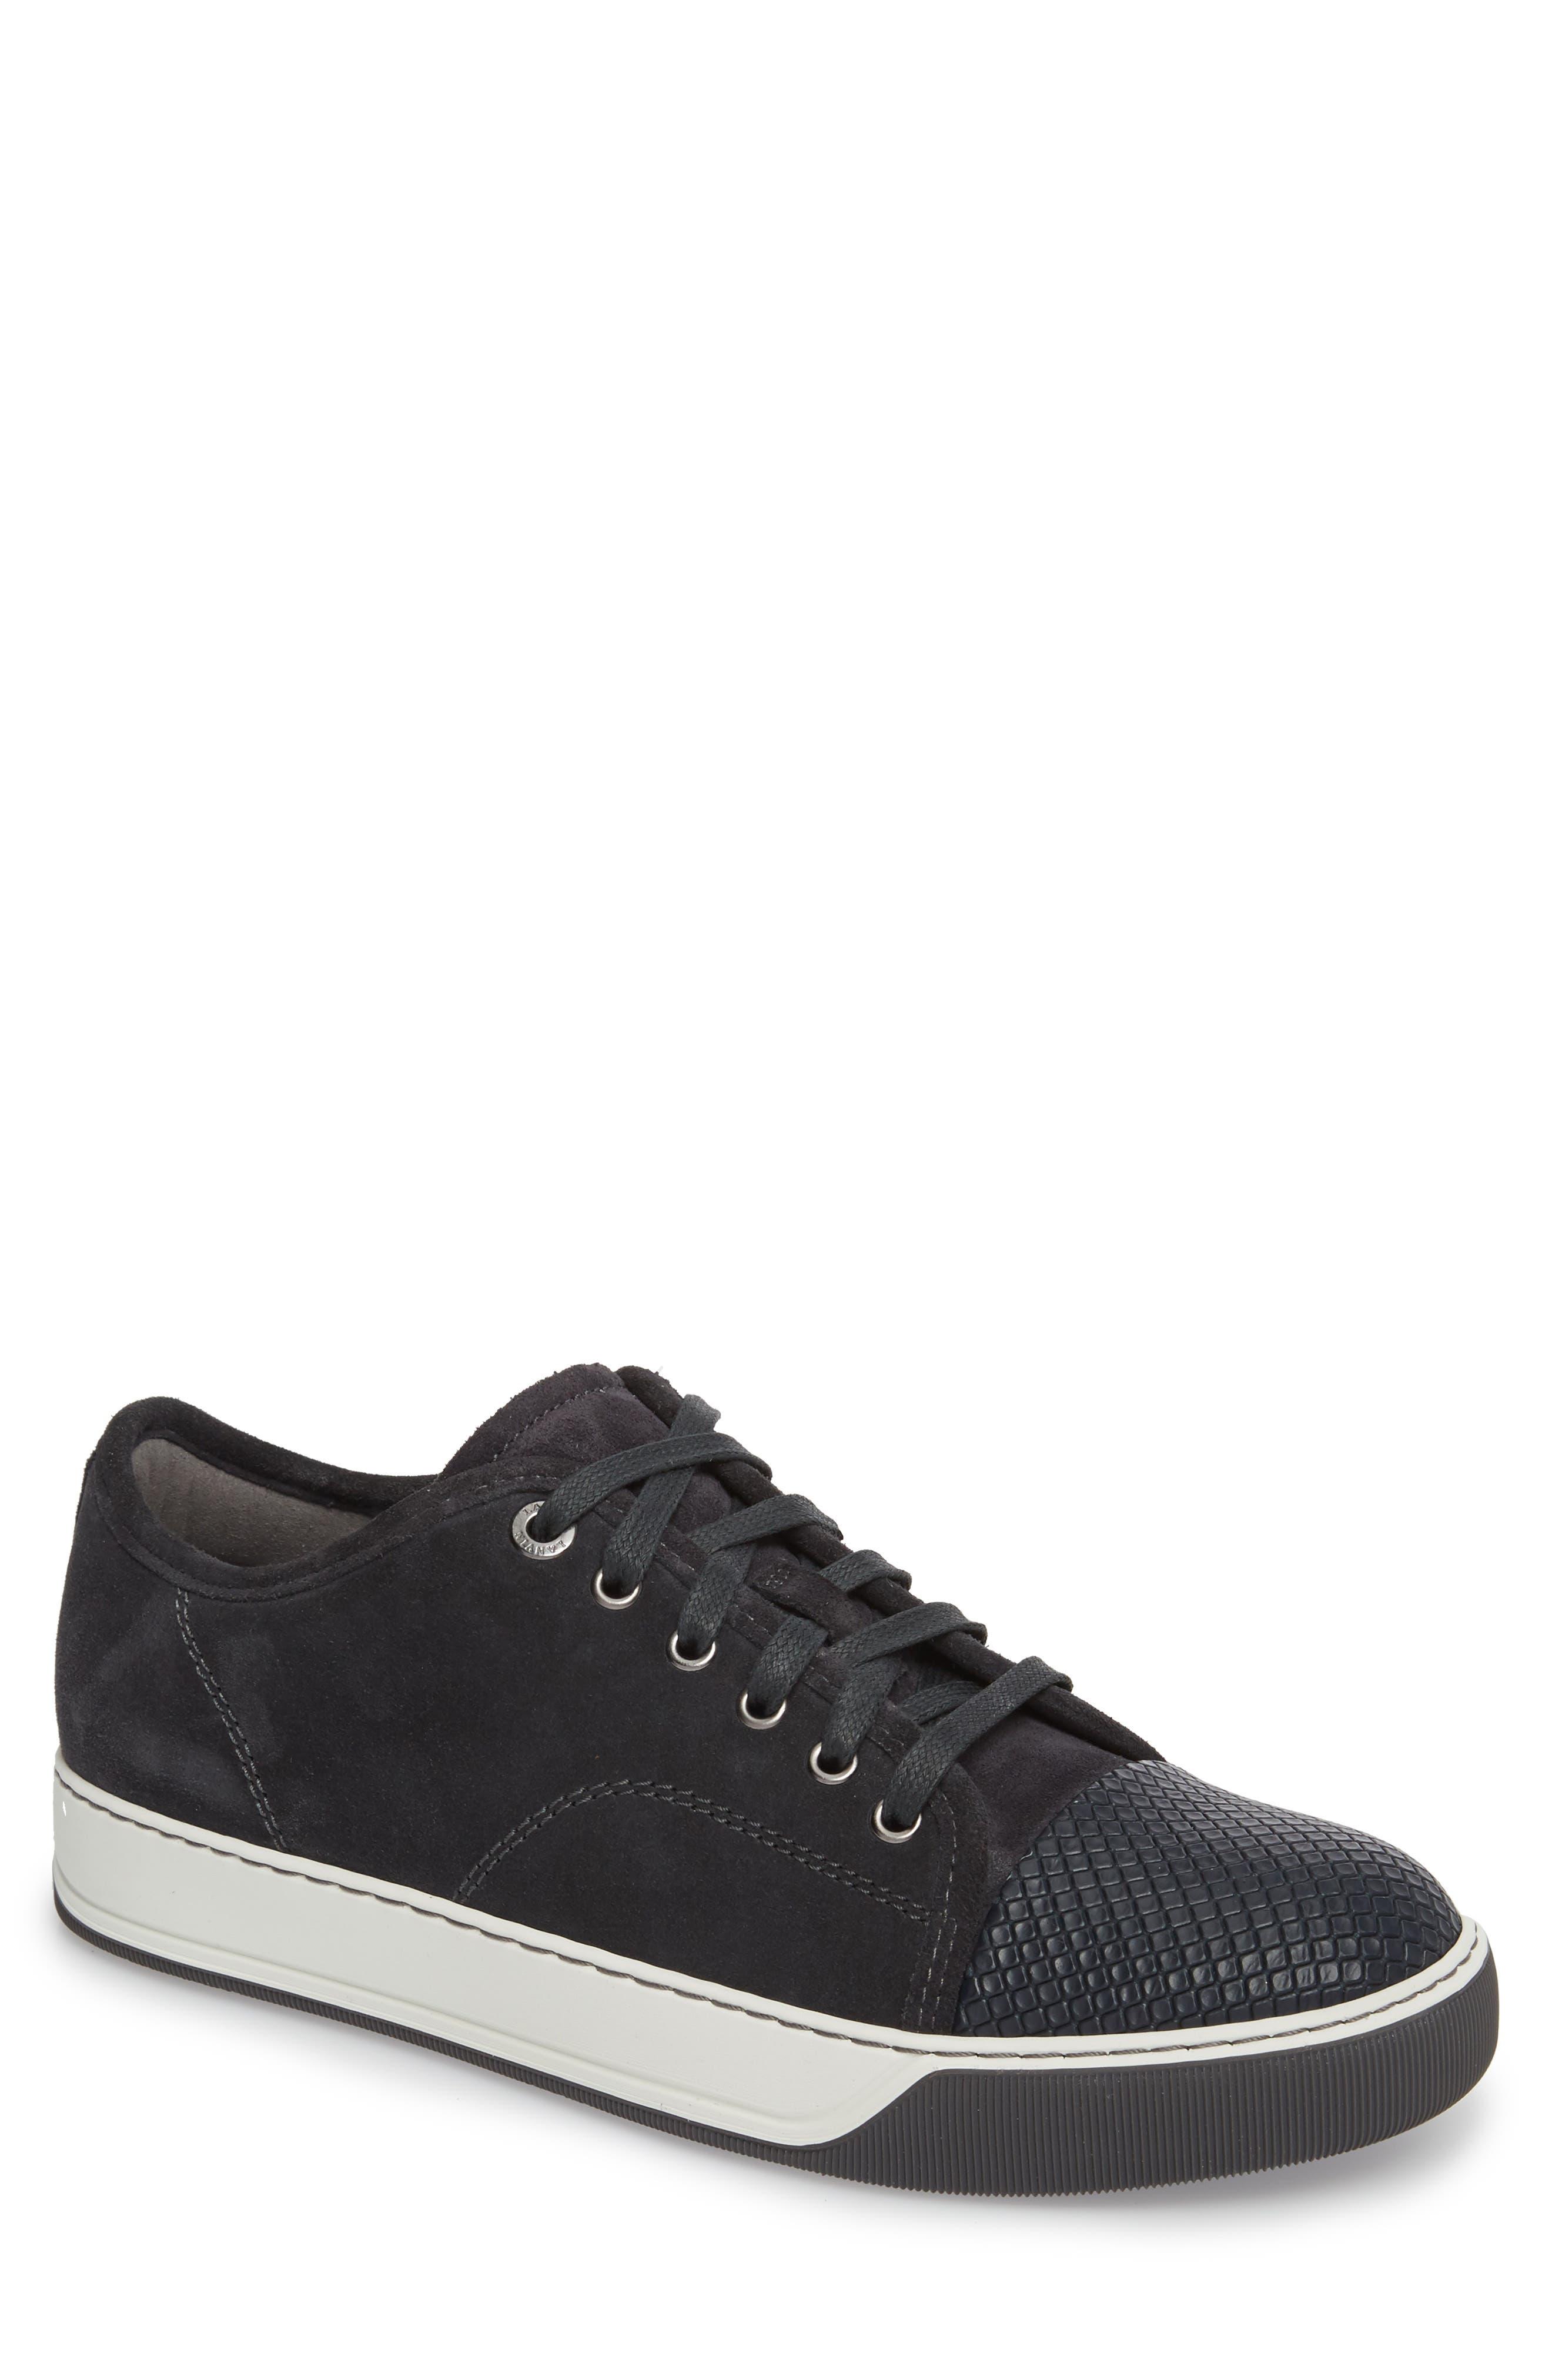 Main Image - Lanvin Classic Textured Cap Toe Sneaker (Men)